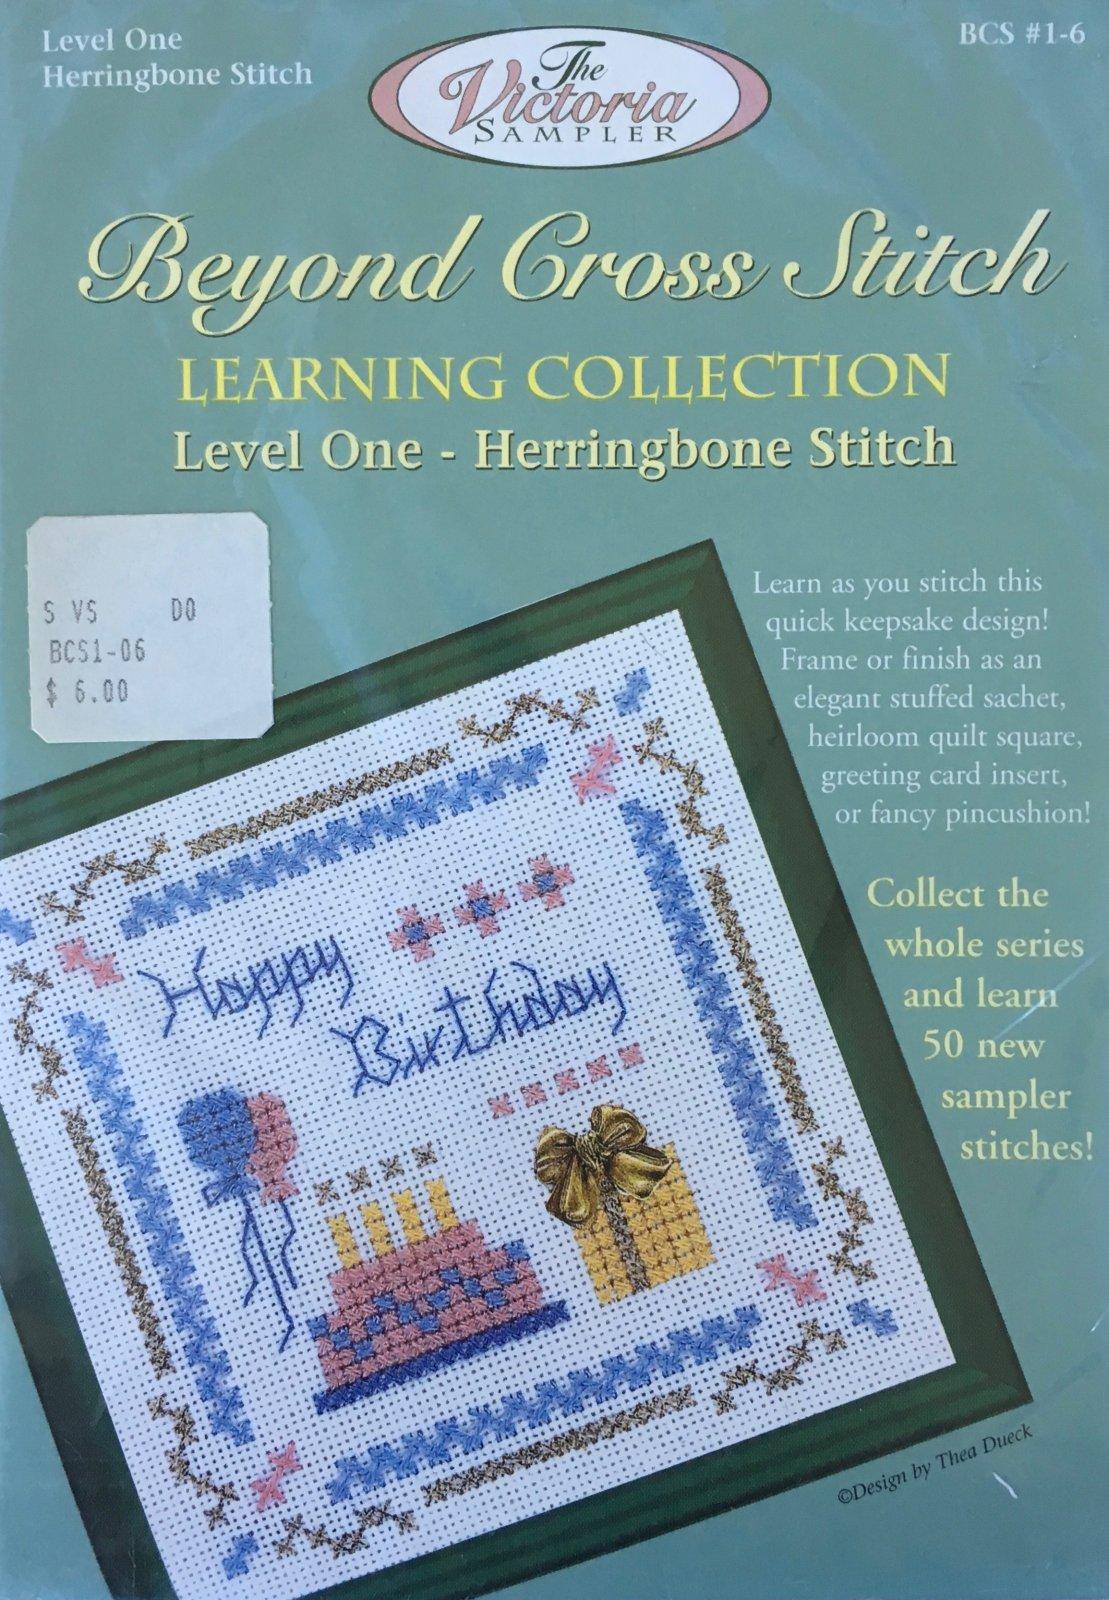 The Victoria Sampler: Happy Birthday Level 1 - #6 Kit; Herringbone Stitch